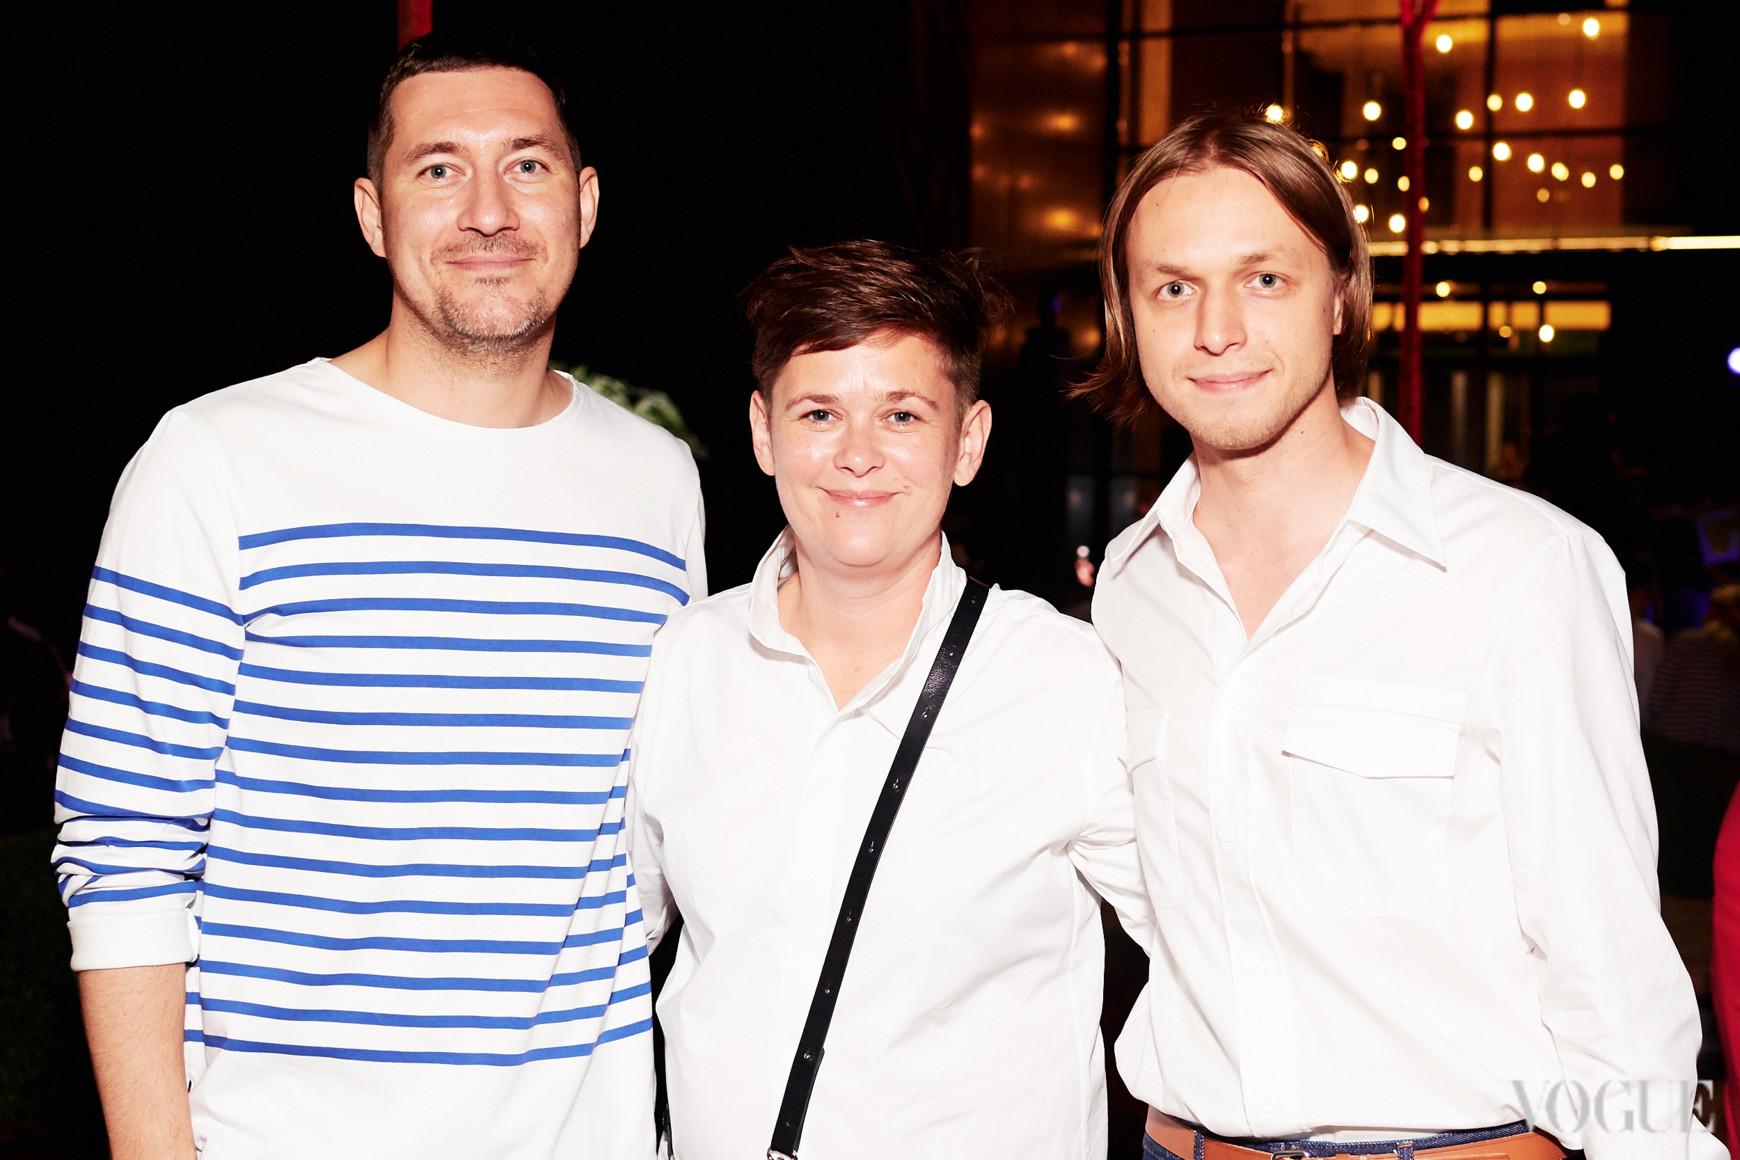 Александр Онацкий, Юлия Макгаффи и Евгений Примаченко